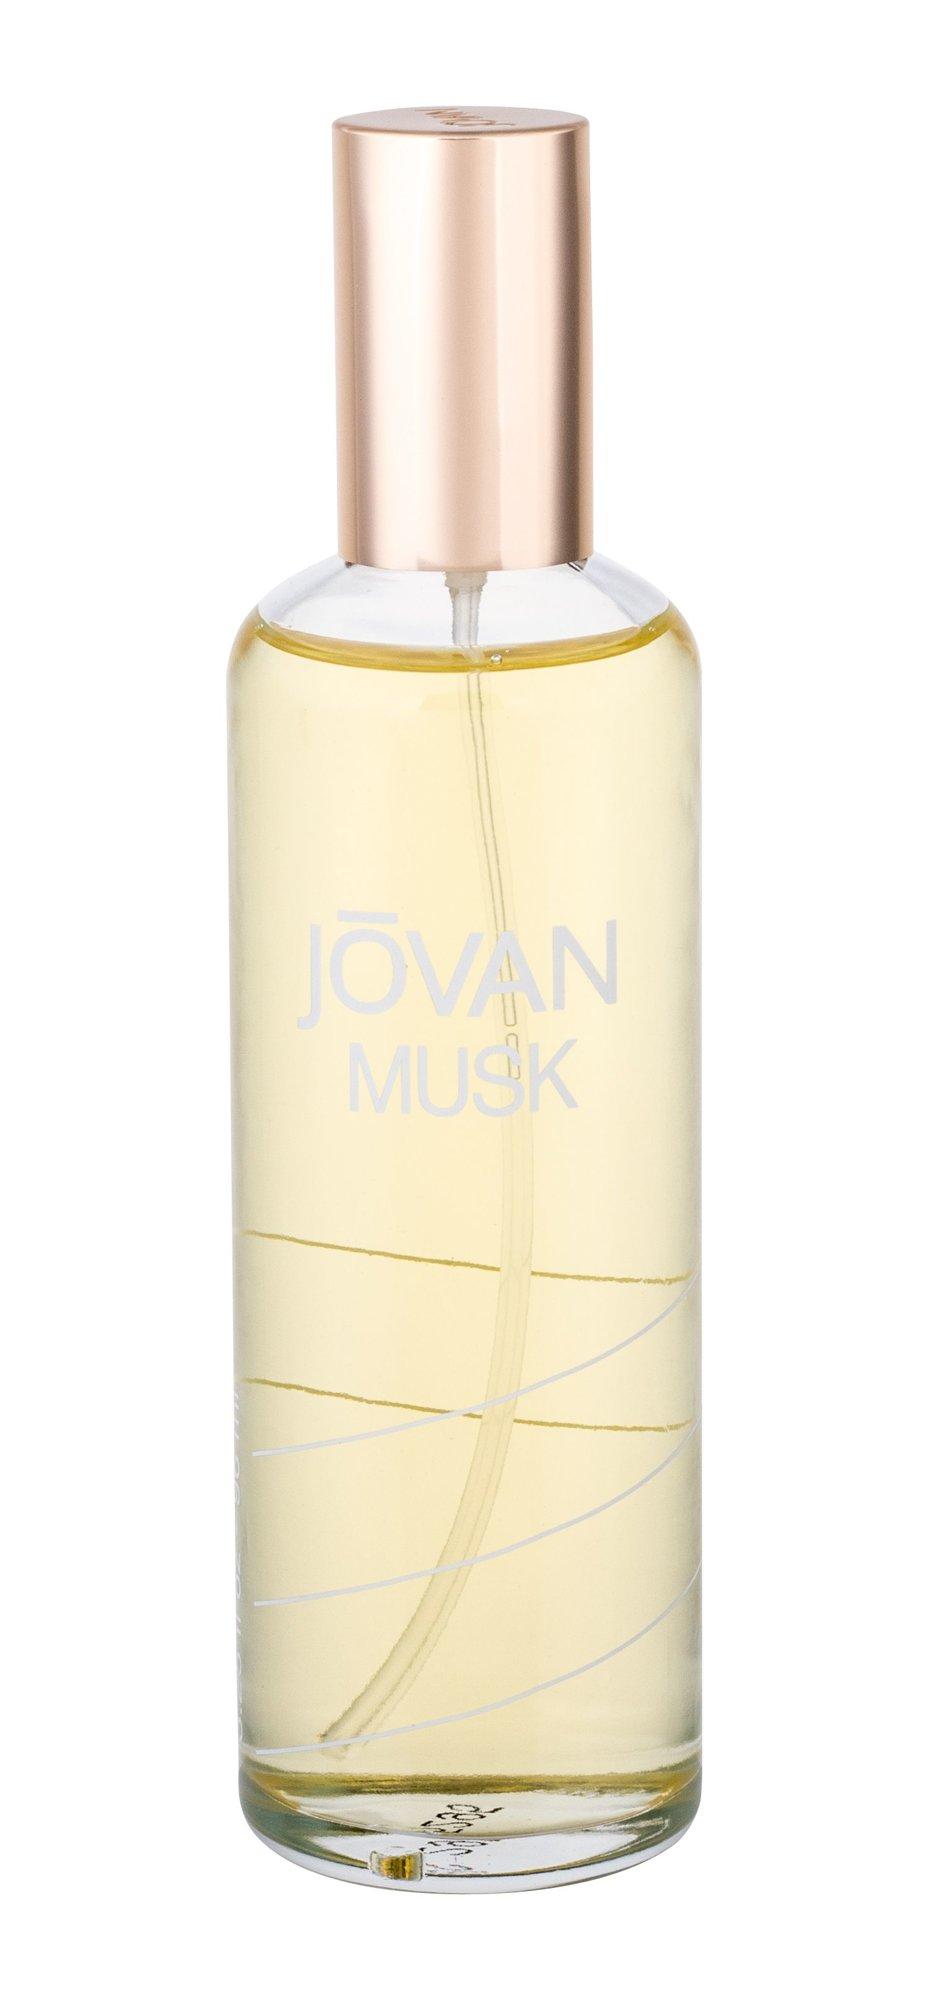 Jovan Musk Cologne 96ml